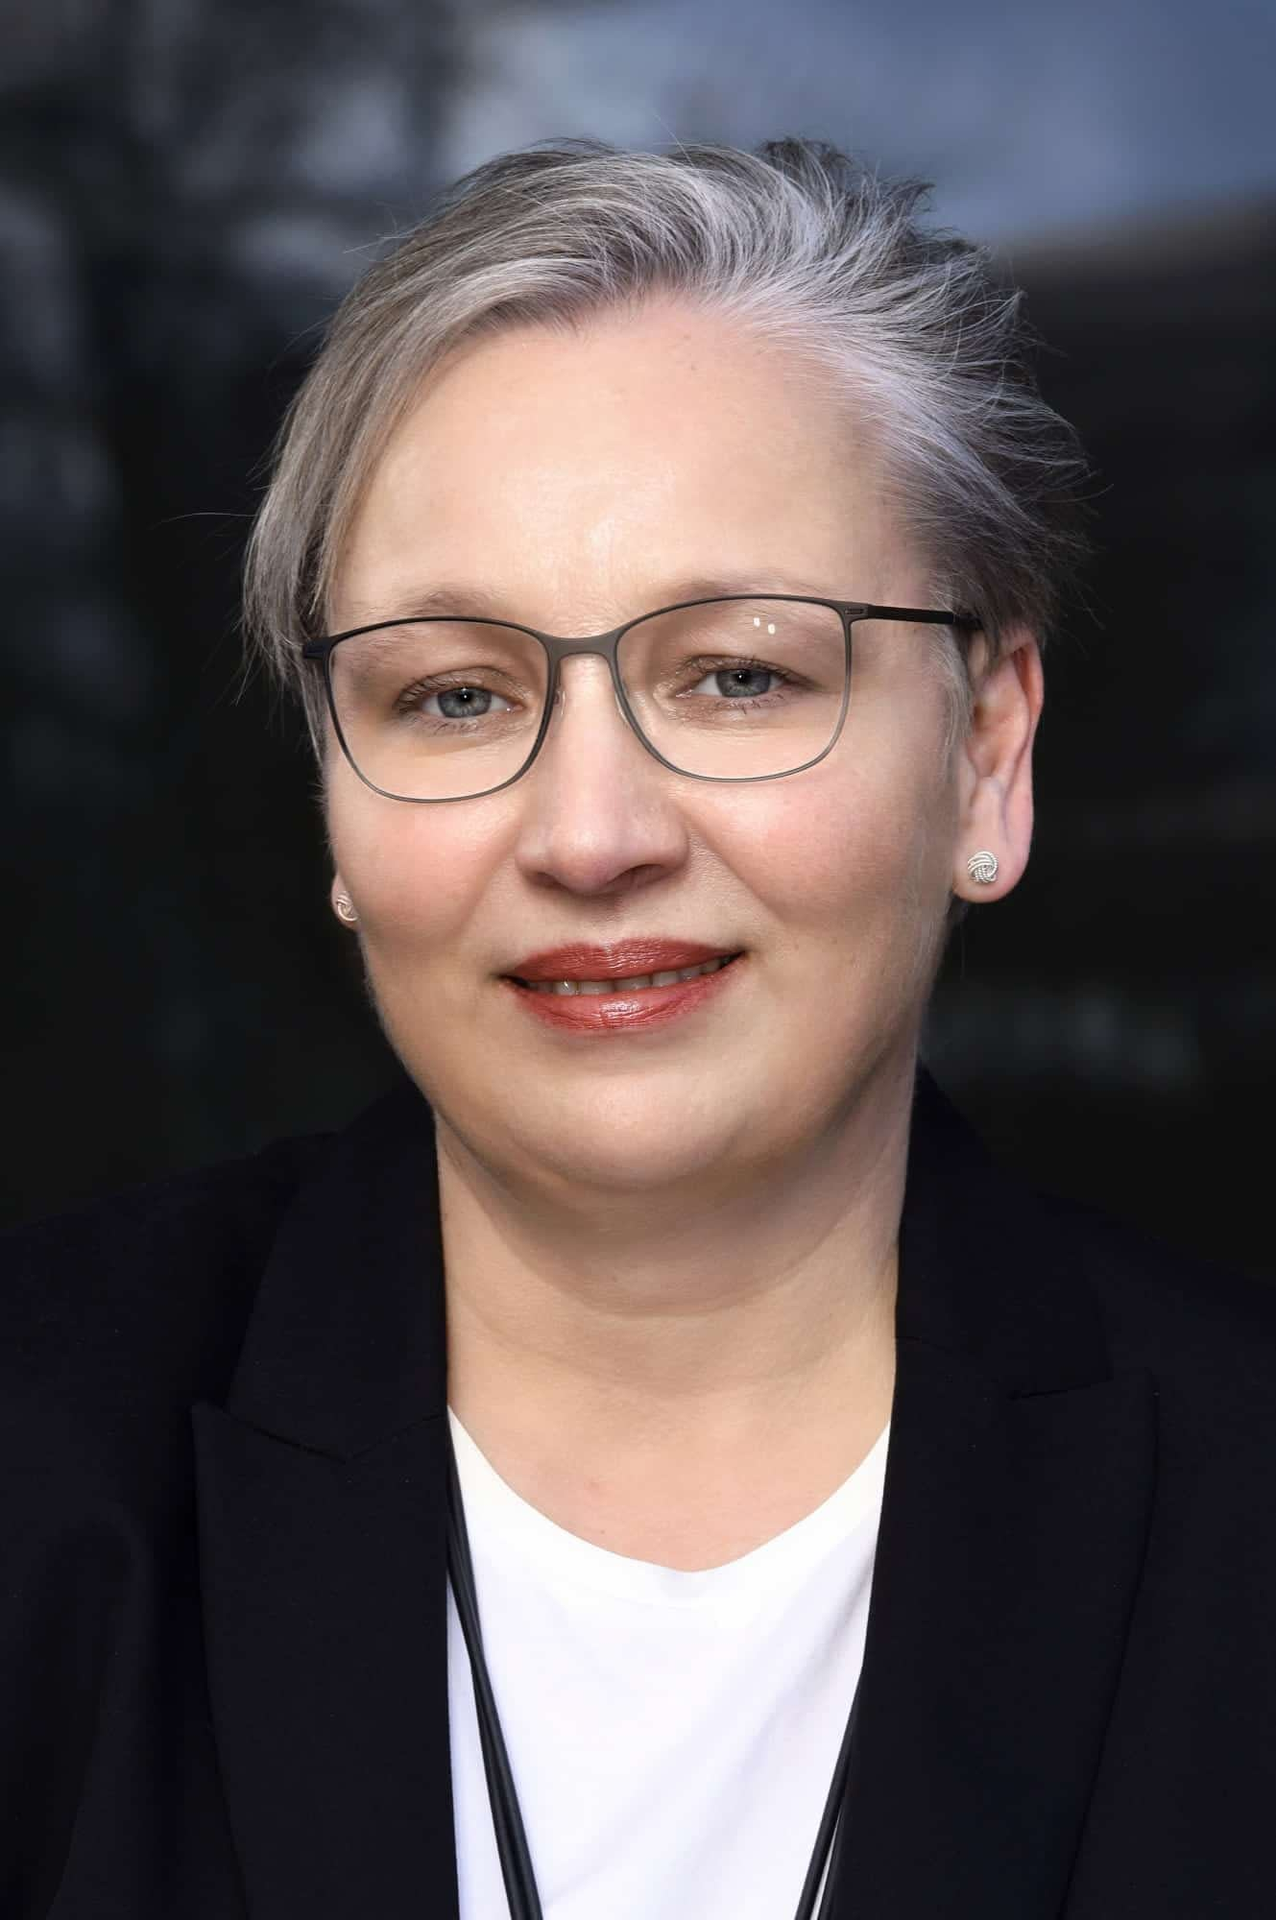 Iris Bothe kandidiert